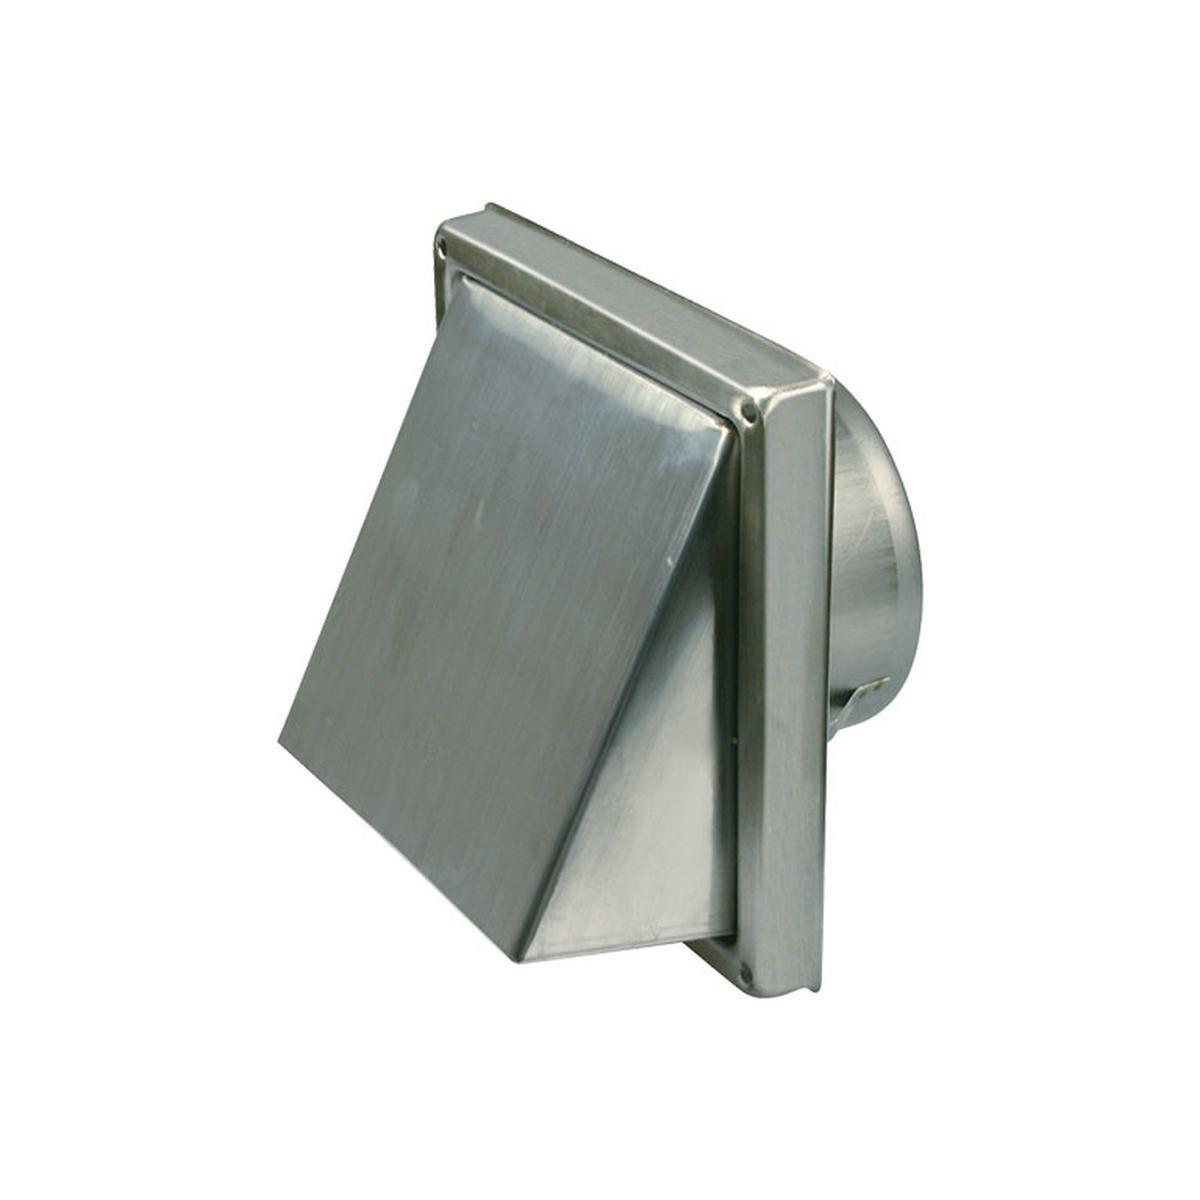 Klapventil Ø125 mm. rustfri stål